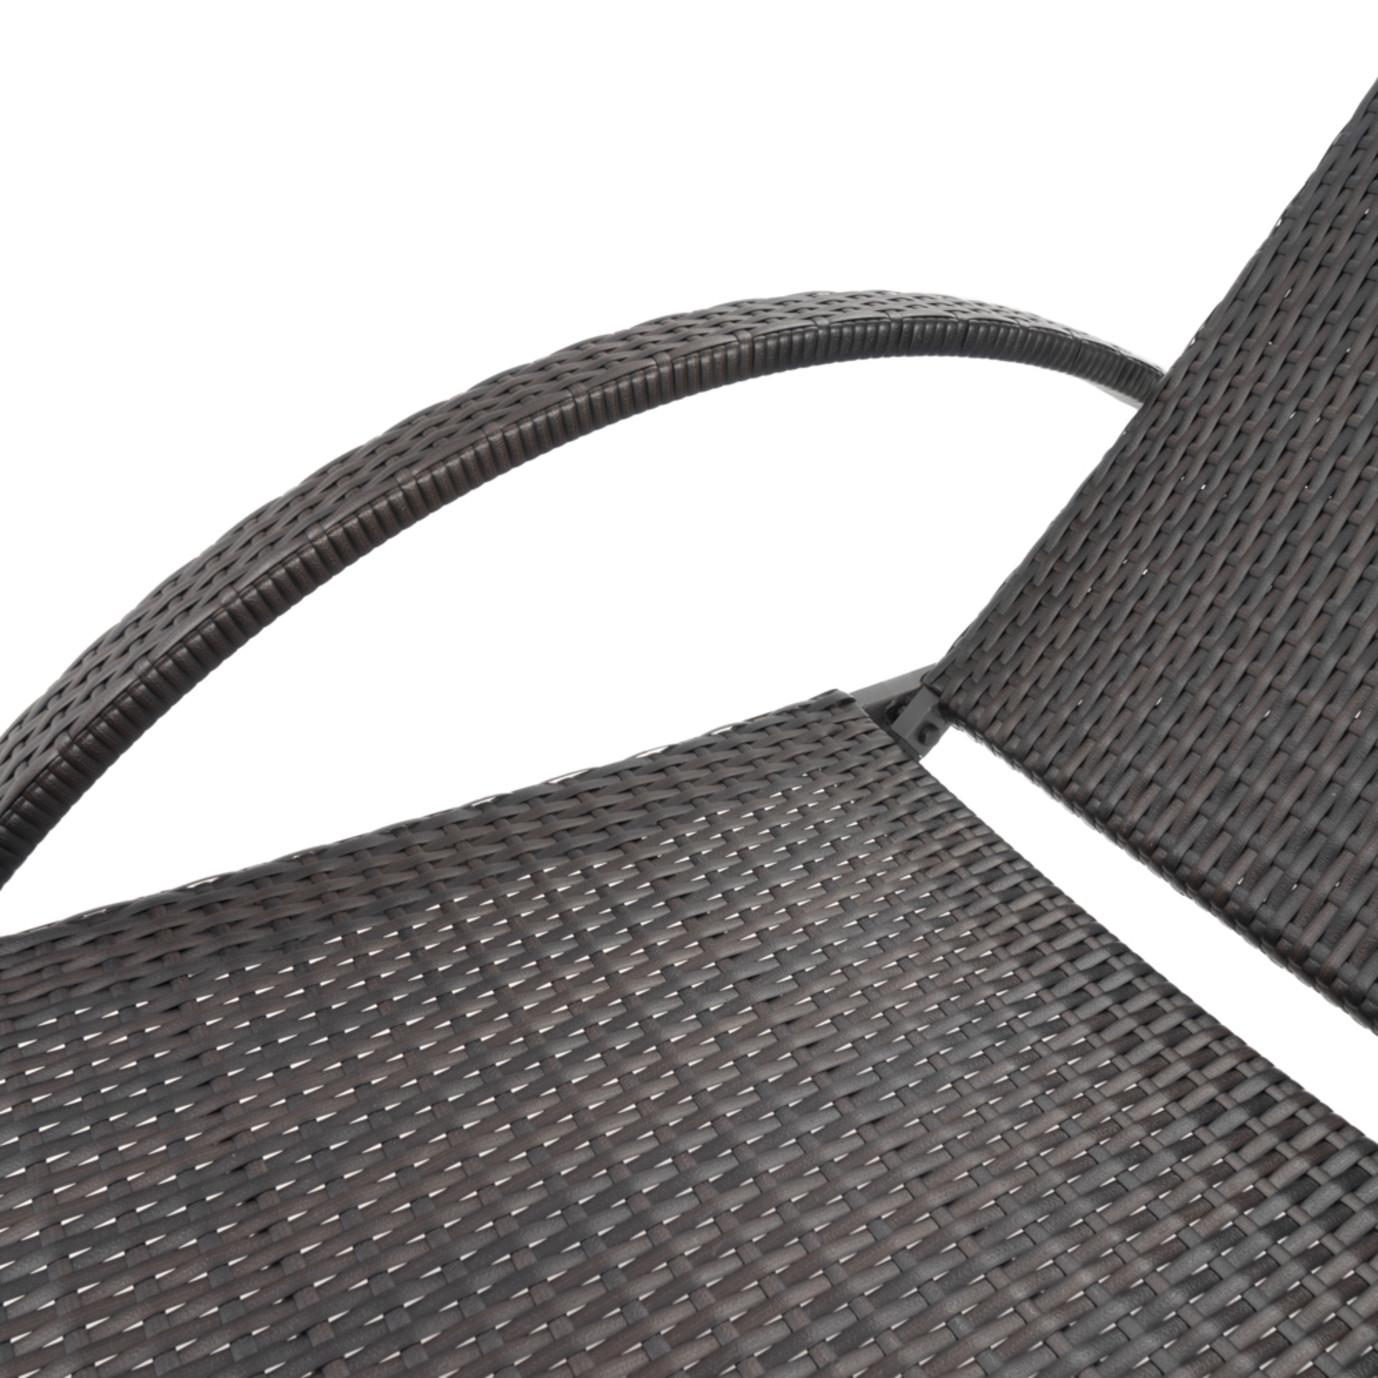 Deco™ Chaise Lounges with Cushions - Regatta Blue